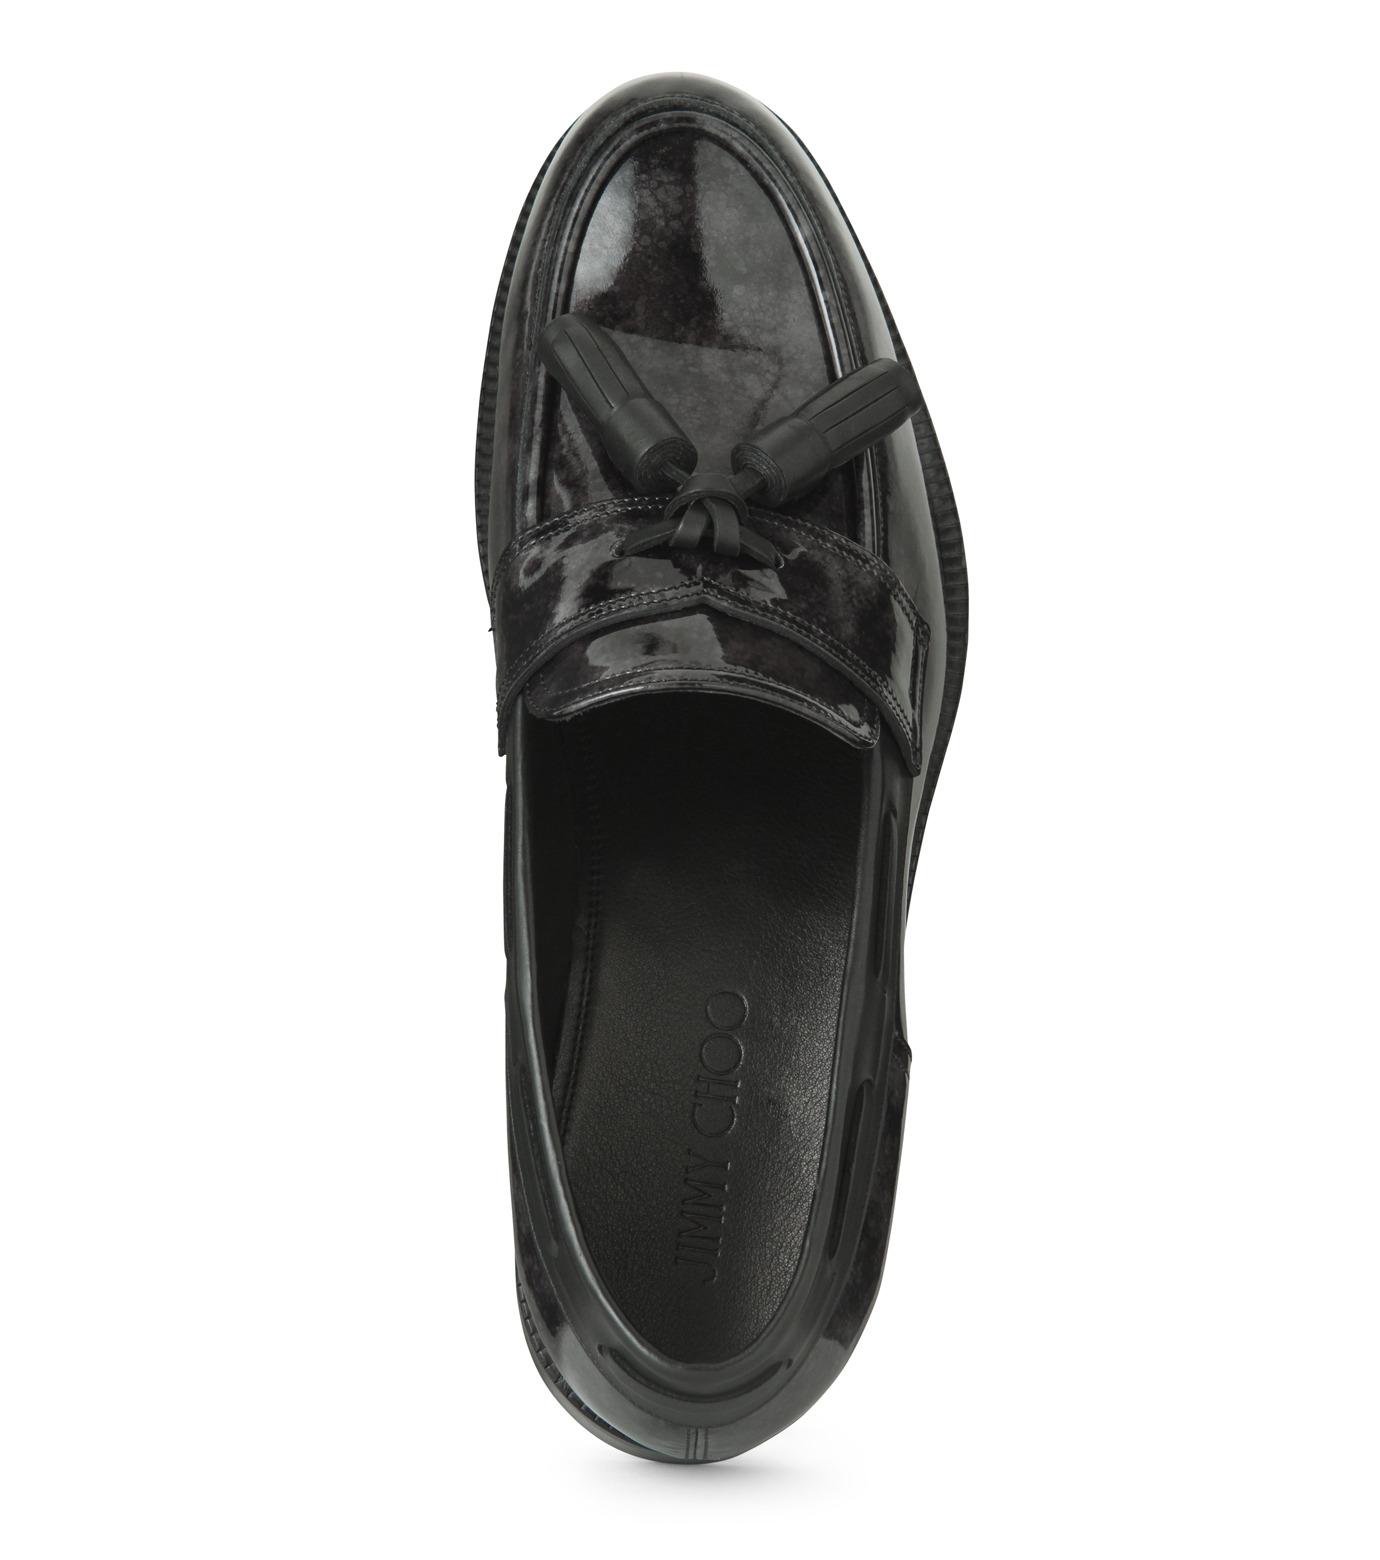 Jimmy Choo(ジミーチュウ)のMarble Patent-BLACK(シューズ/shoes)-NATHAN-MBP-13 拡大詳細画像4